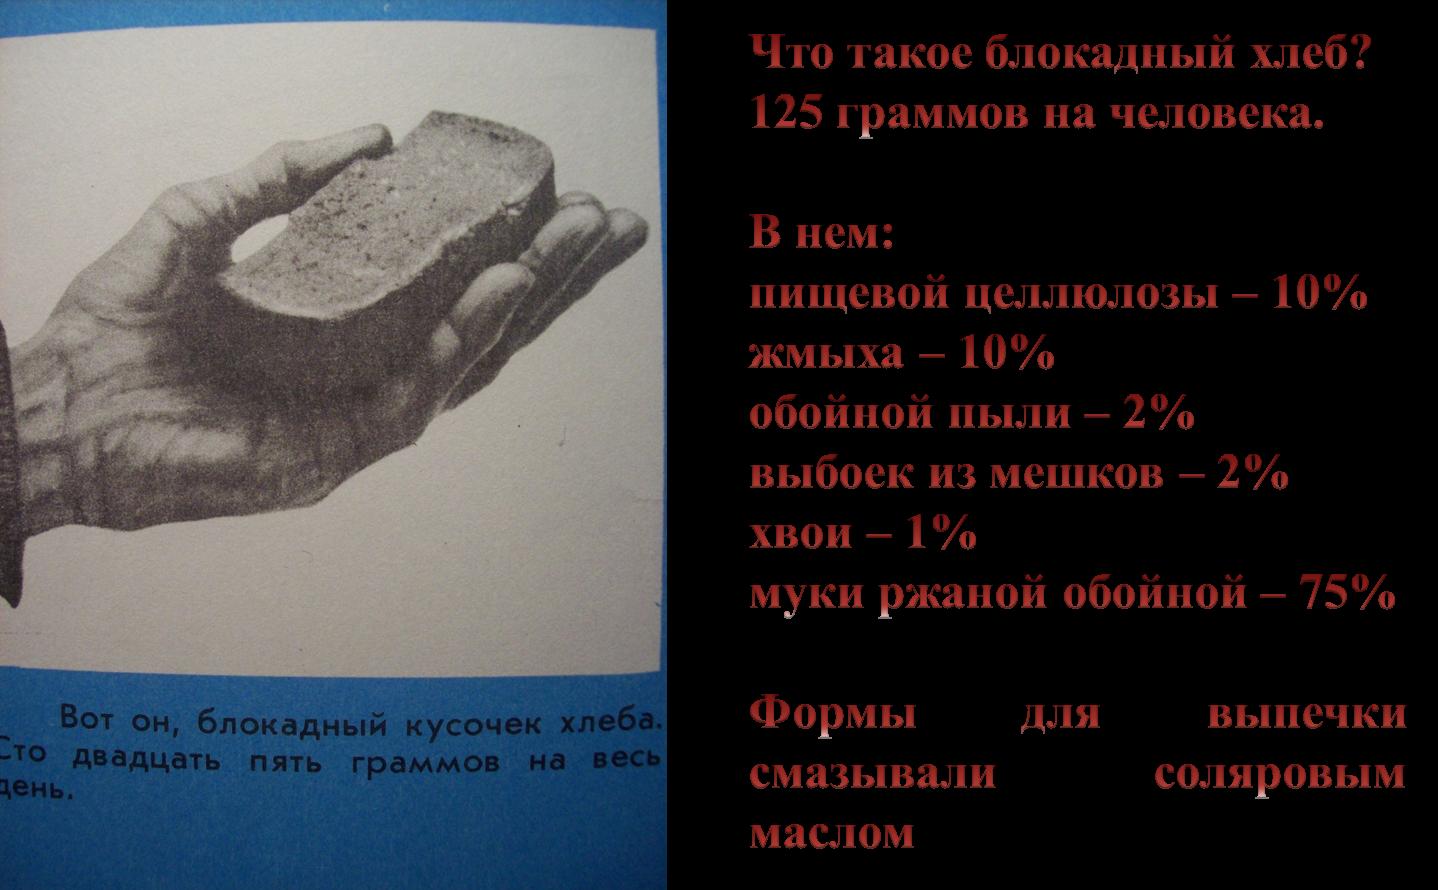 http://doc4web.ru/uploads/files/12/11180/hello_html_m4864f094.png